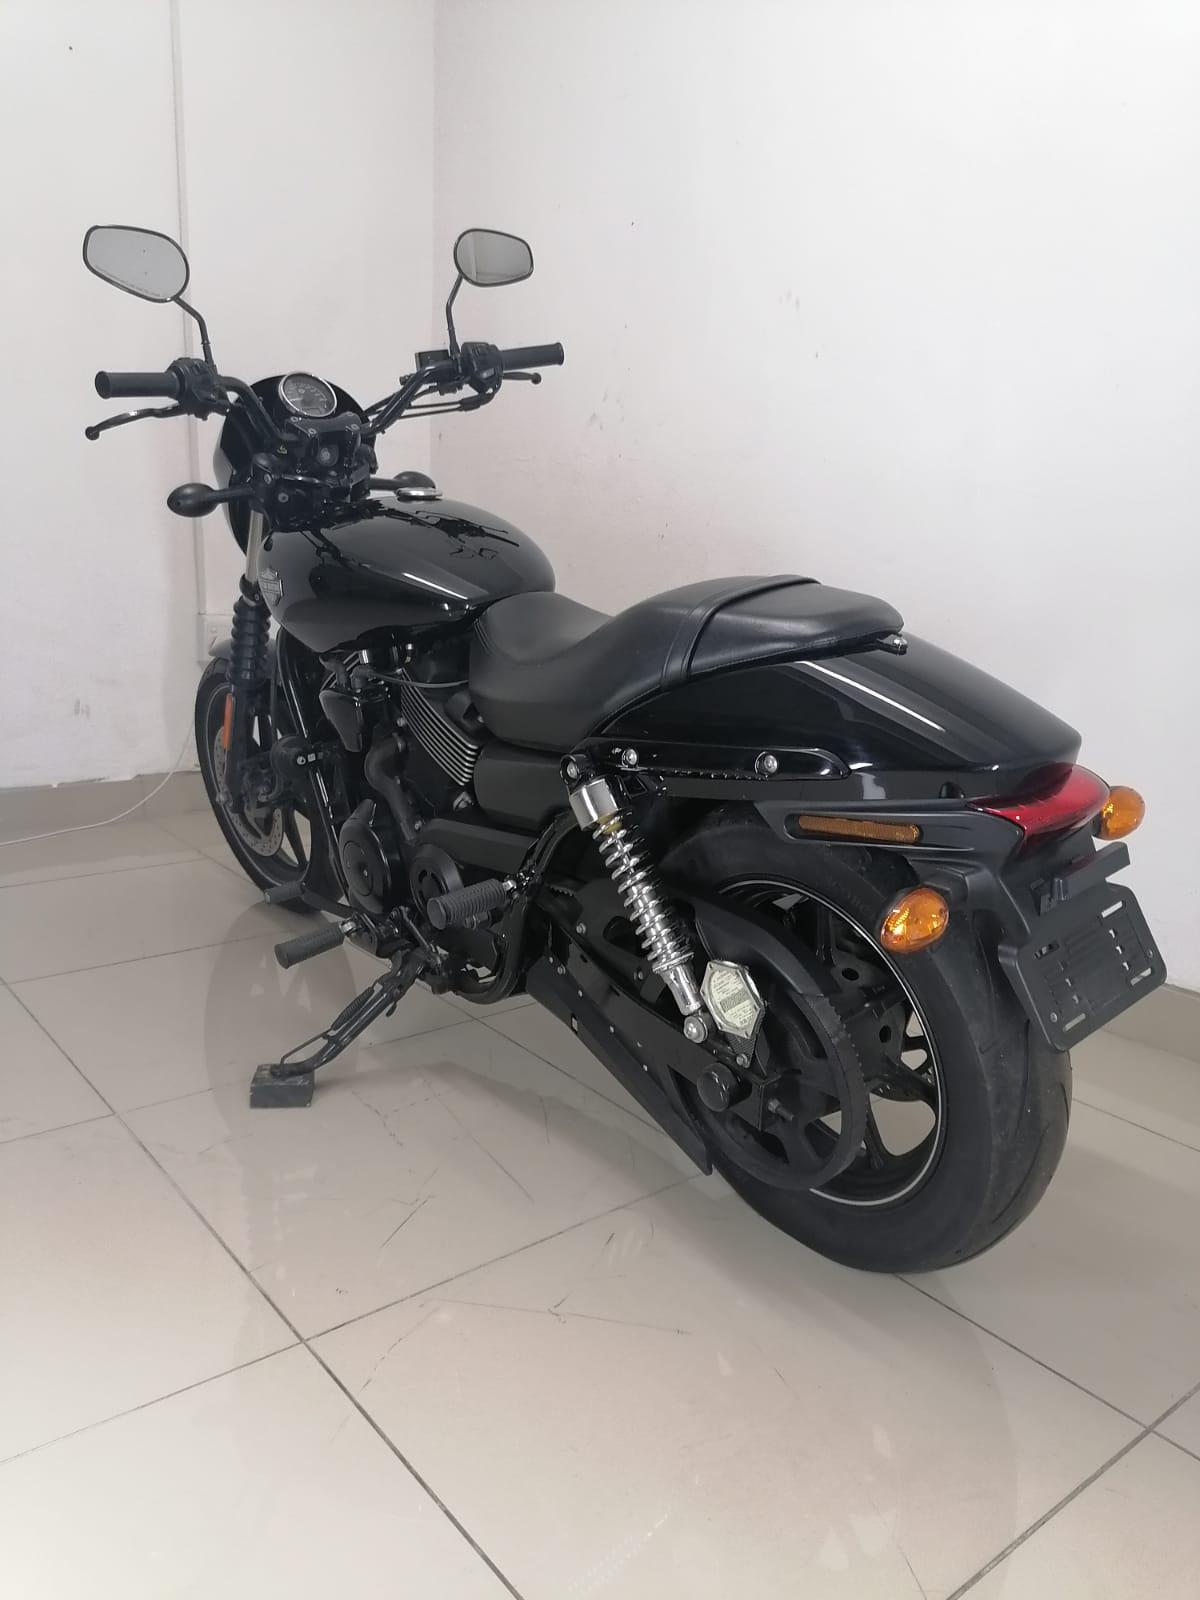 2015 Harley Davidson FXE